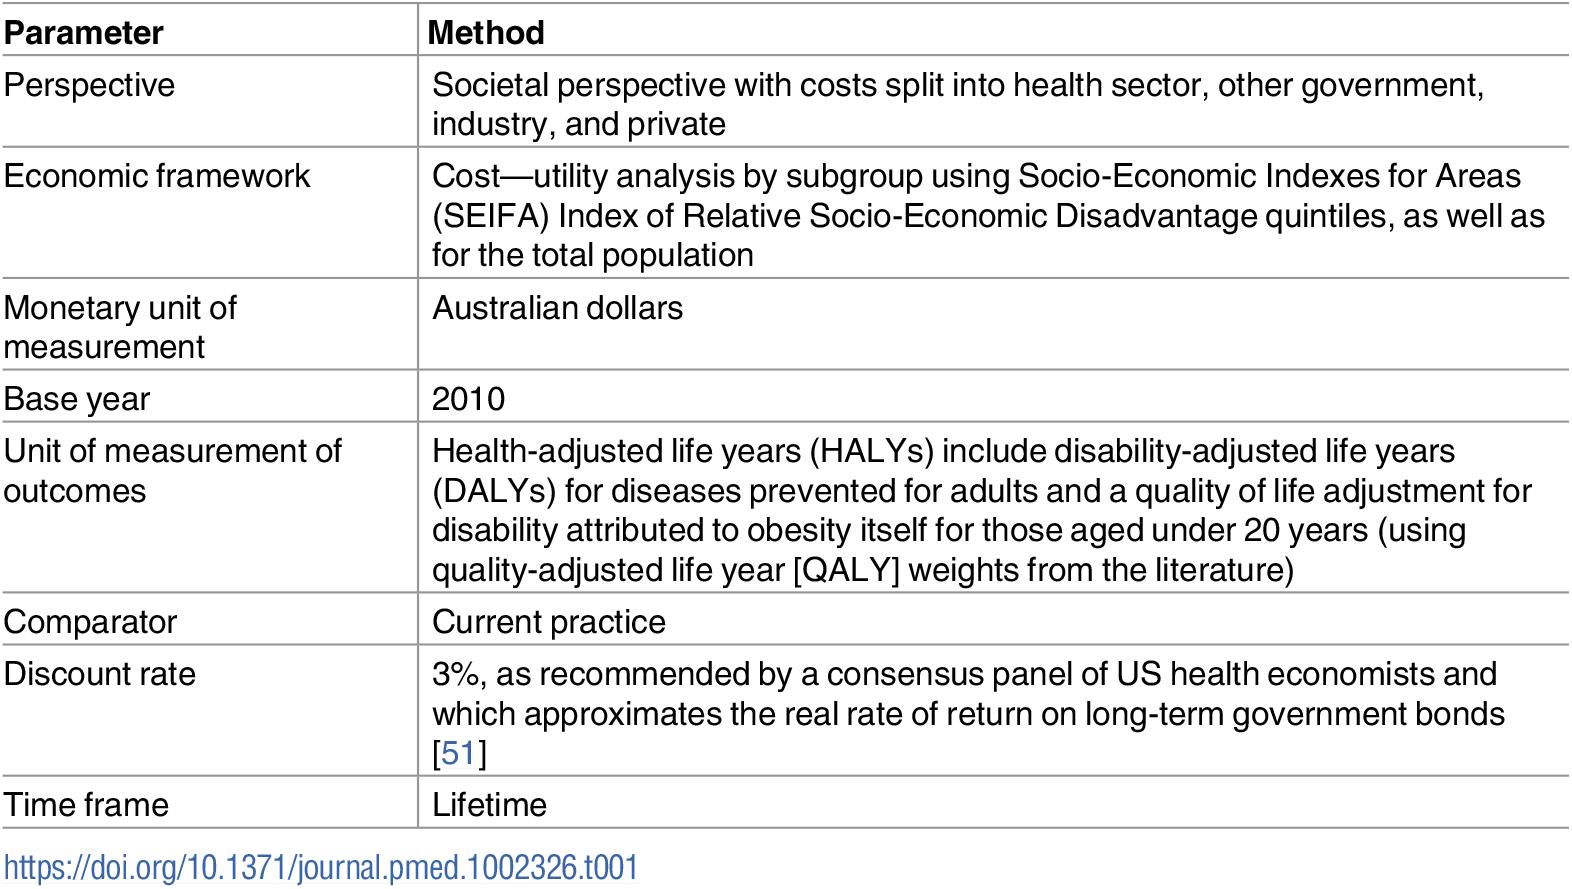 General economic evaluation methods.